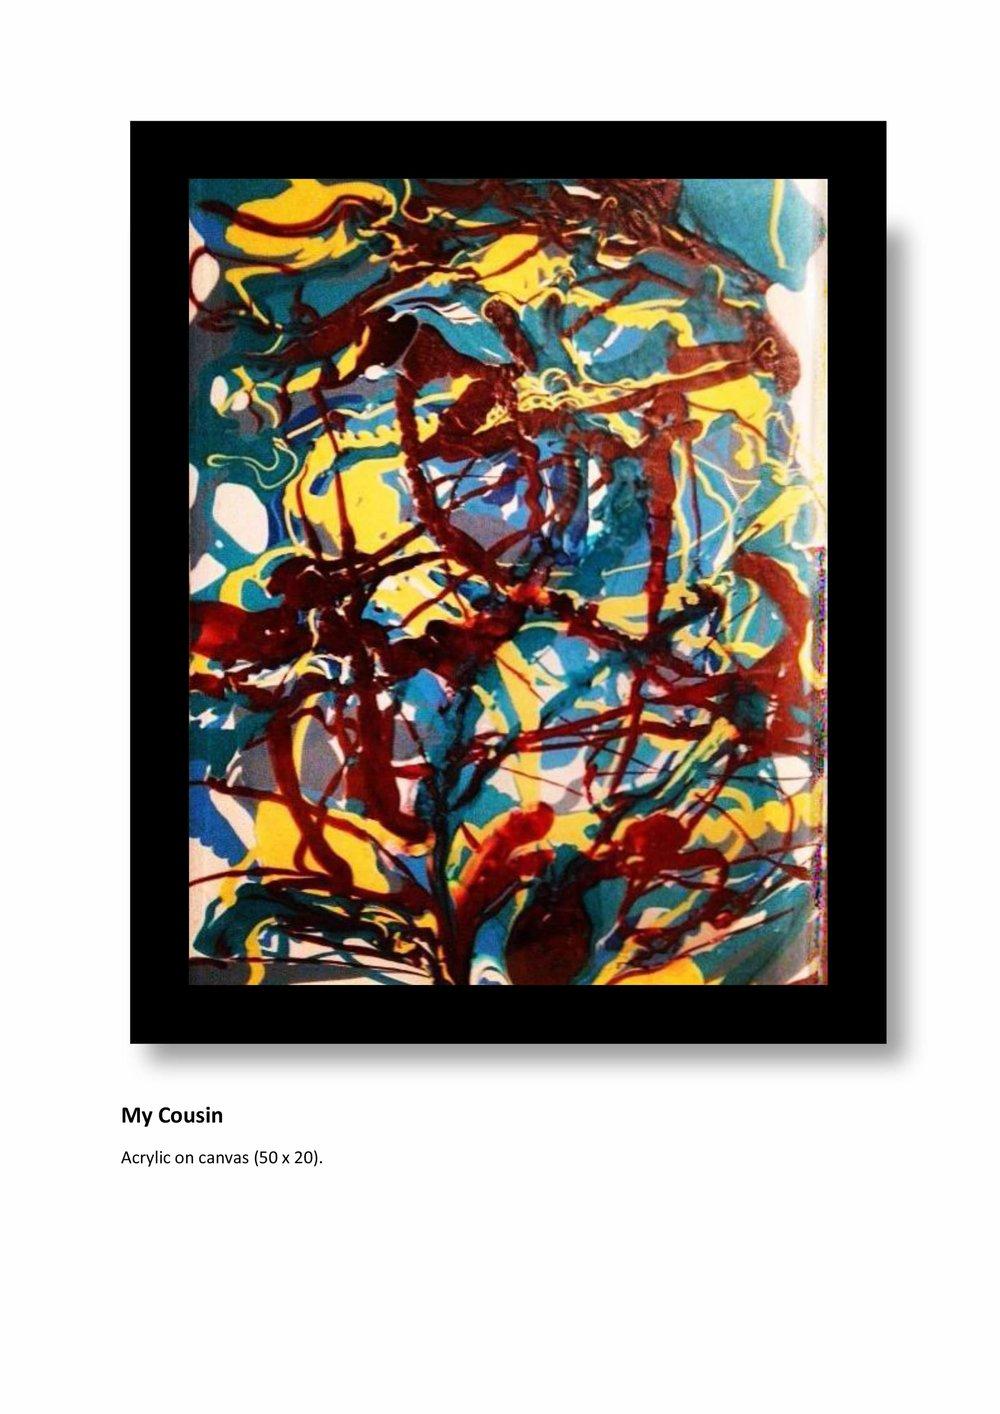 art-portfolio-aglae-corrected-26-min.jpg